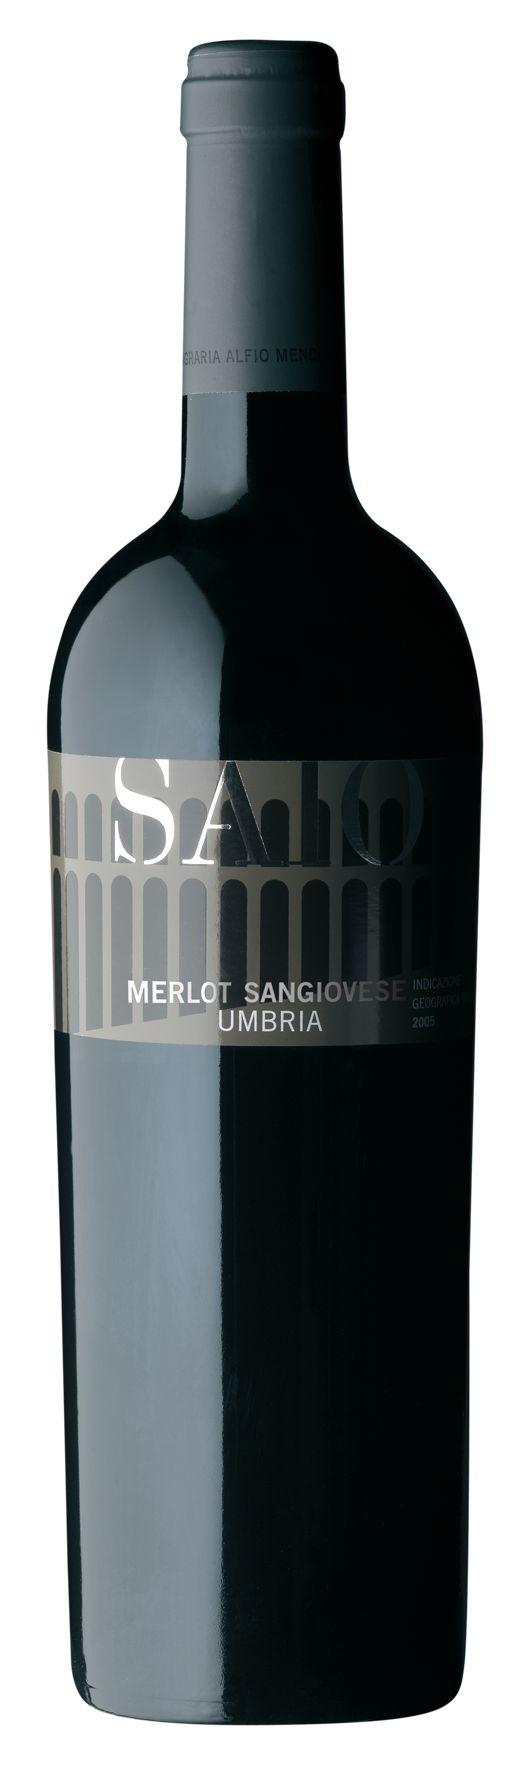 Merlot Sangiovese SAIO Assisi